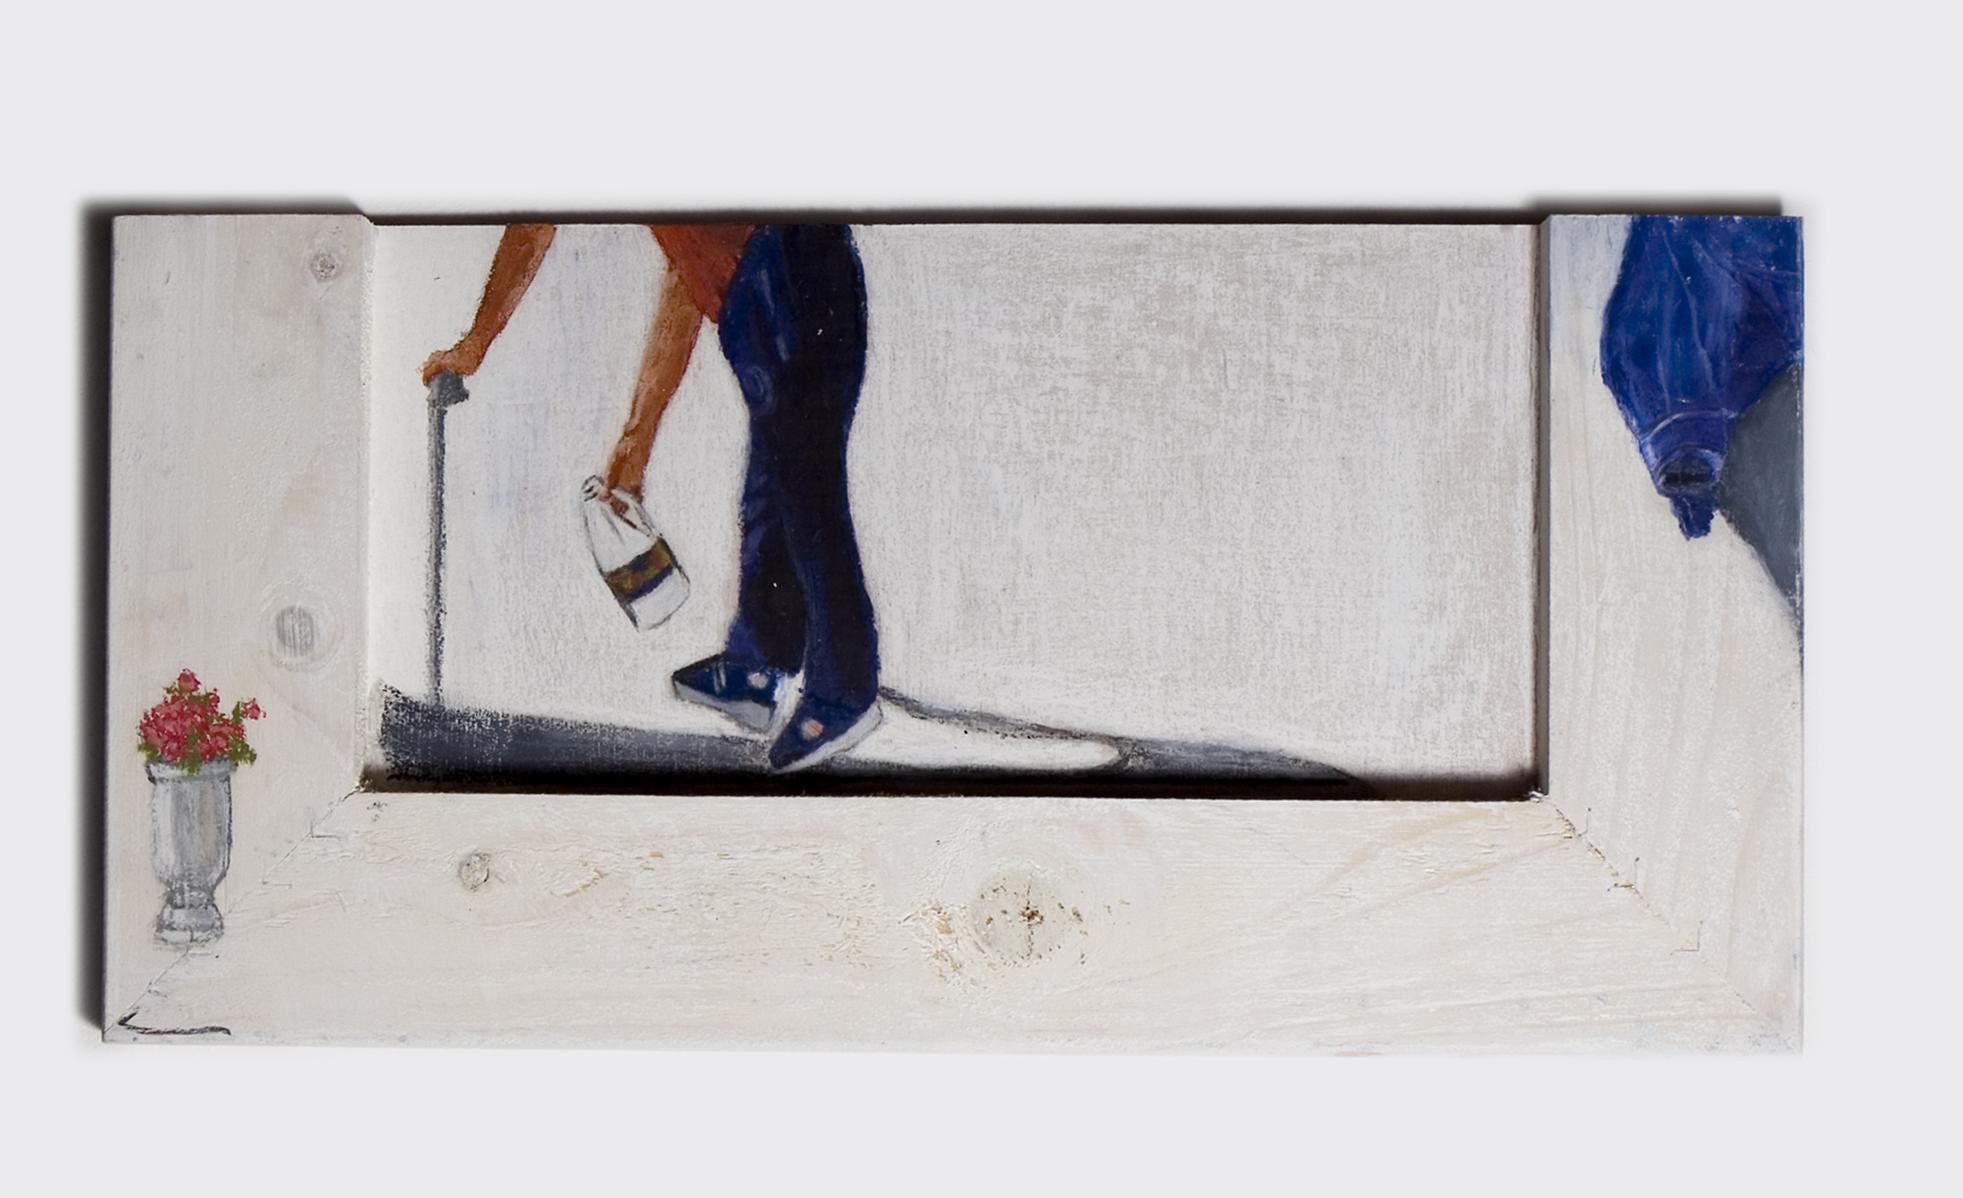 Untitled - 2009 - acrylic and pastel on wood - 37X18cm